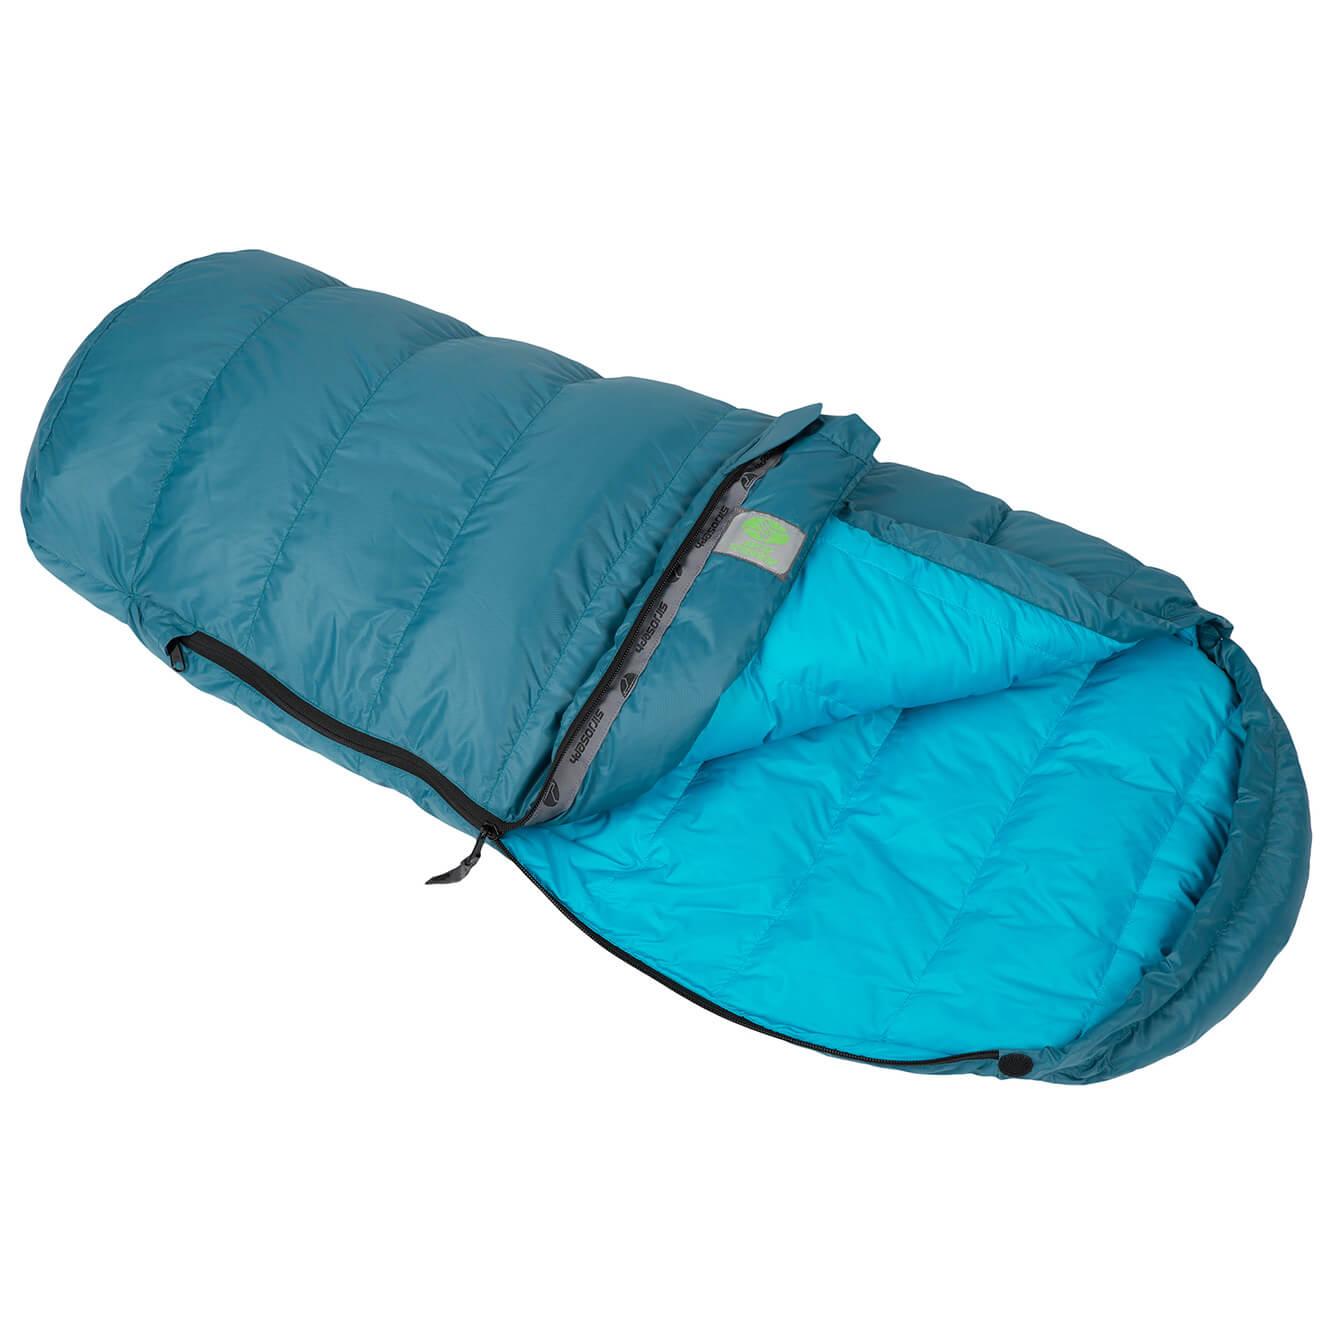 Sir Joseph Kiki Down Sleeping Bag